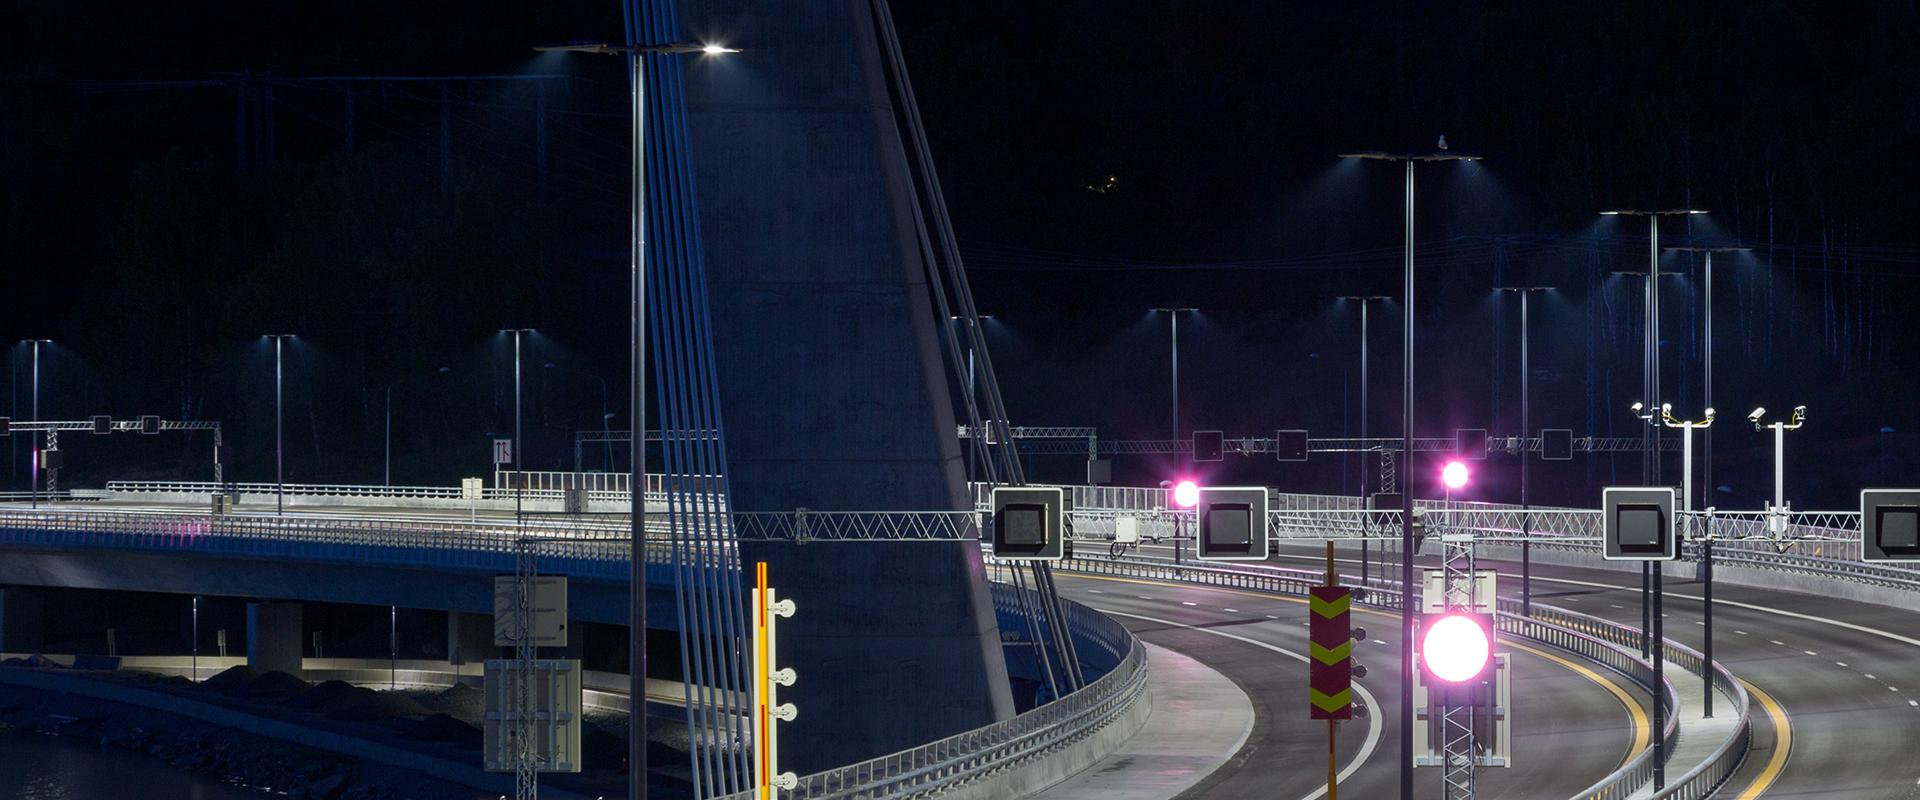 Illuminazione LED del Farris Bridge